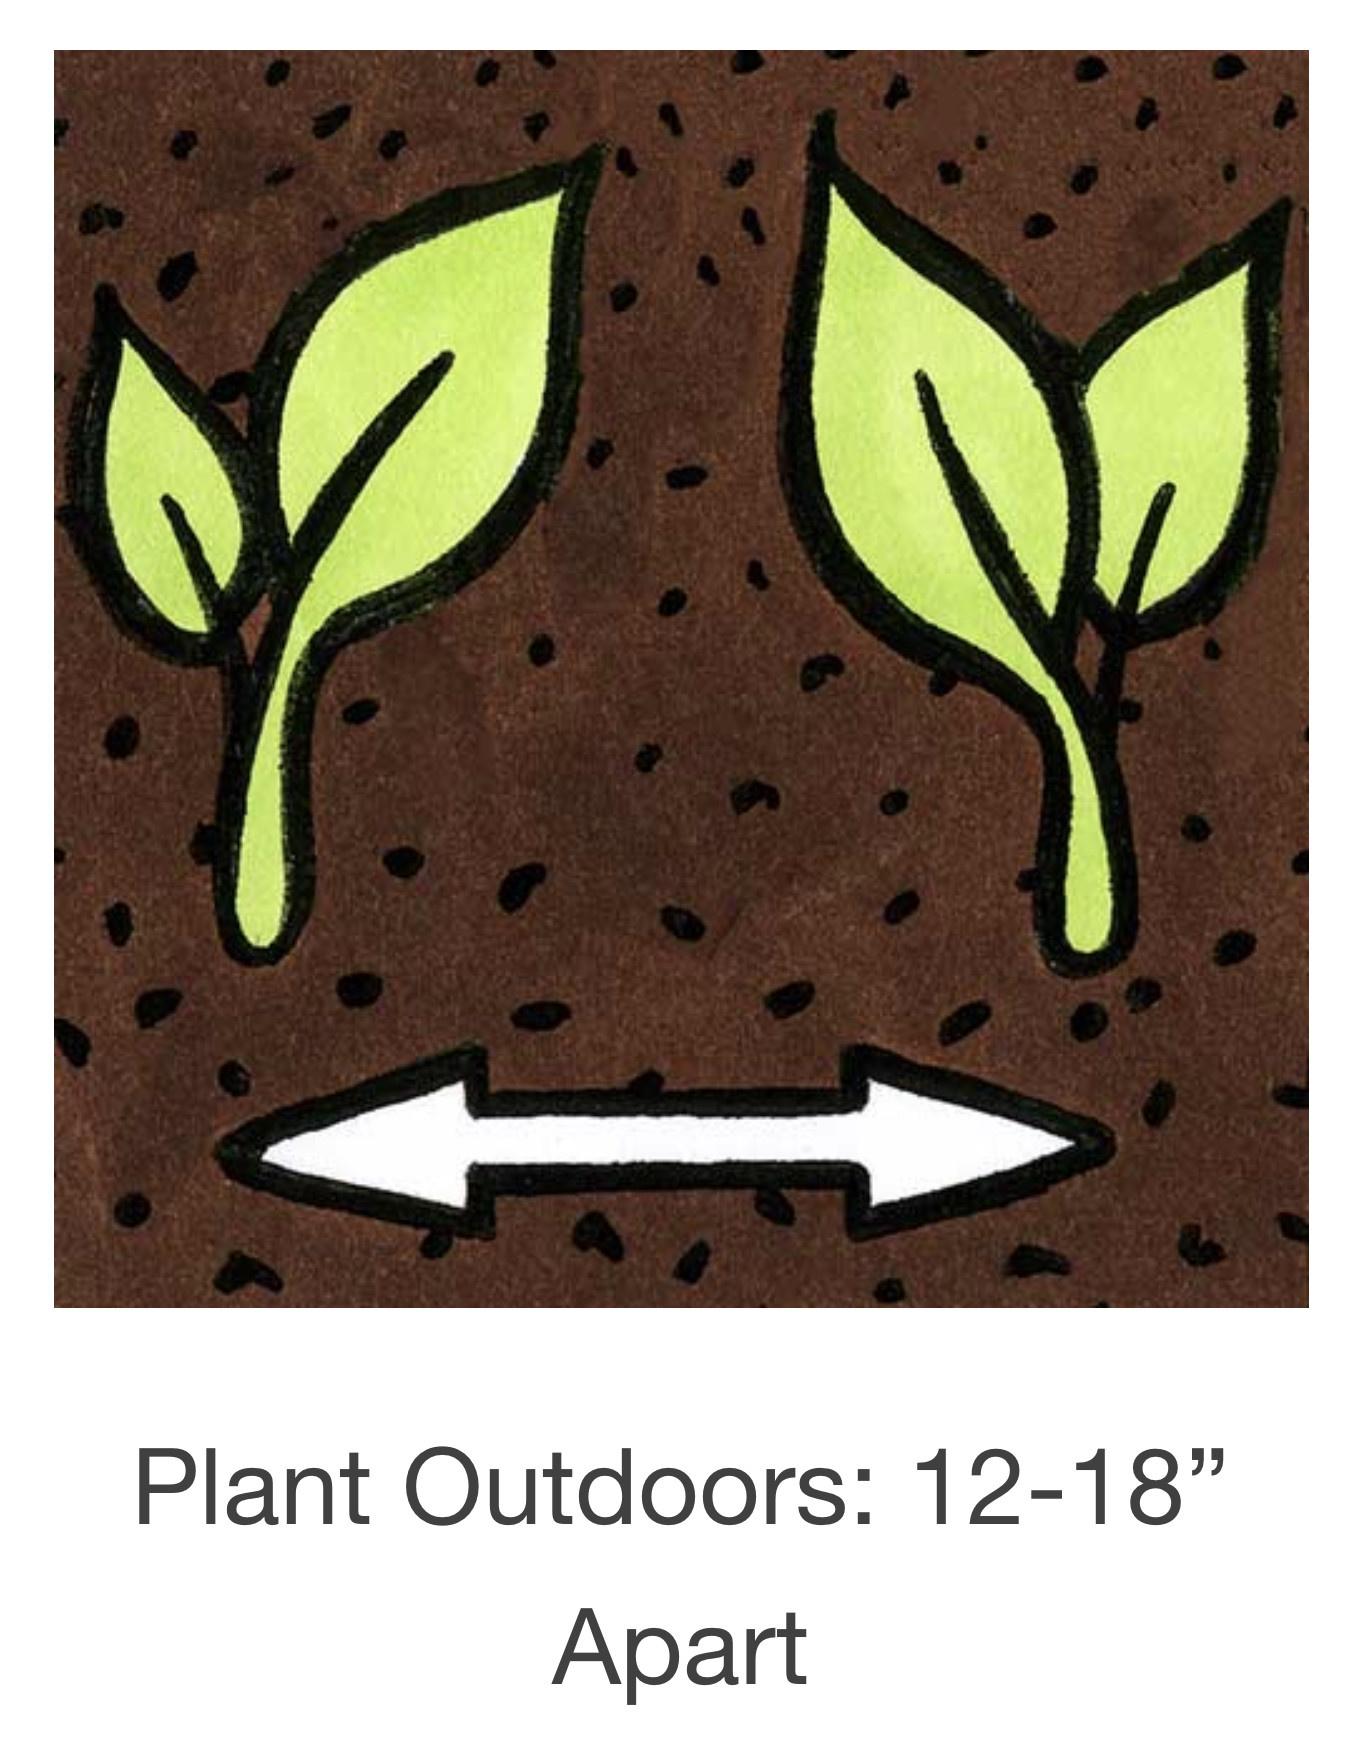 Seed Savers Exchange Ground Cherry Seeds - Loewen Family Heirloom (organic)